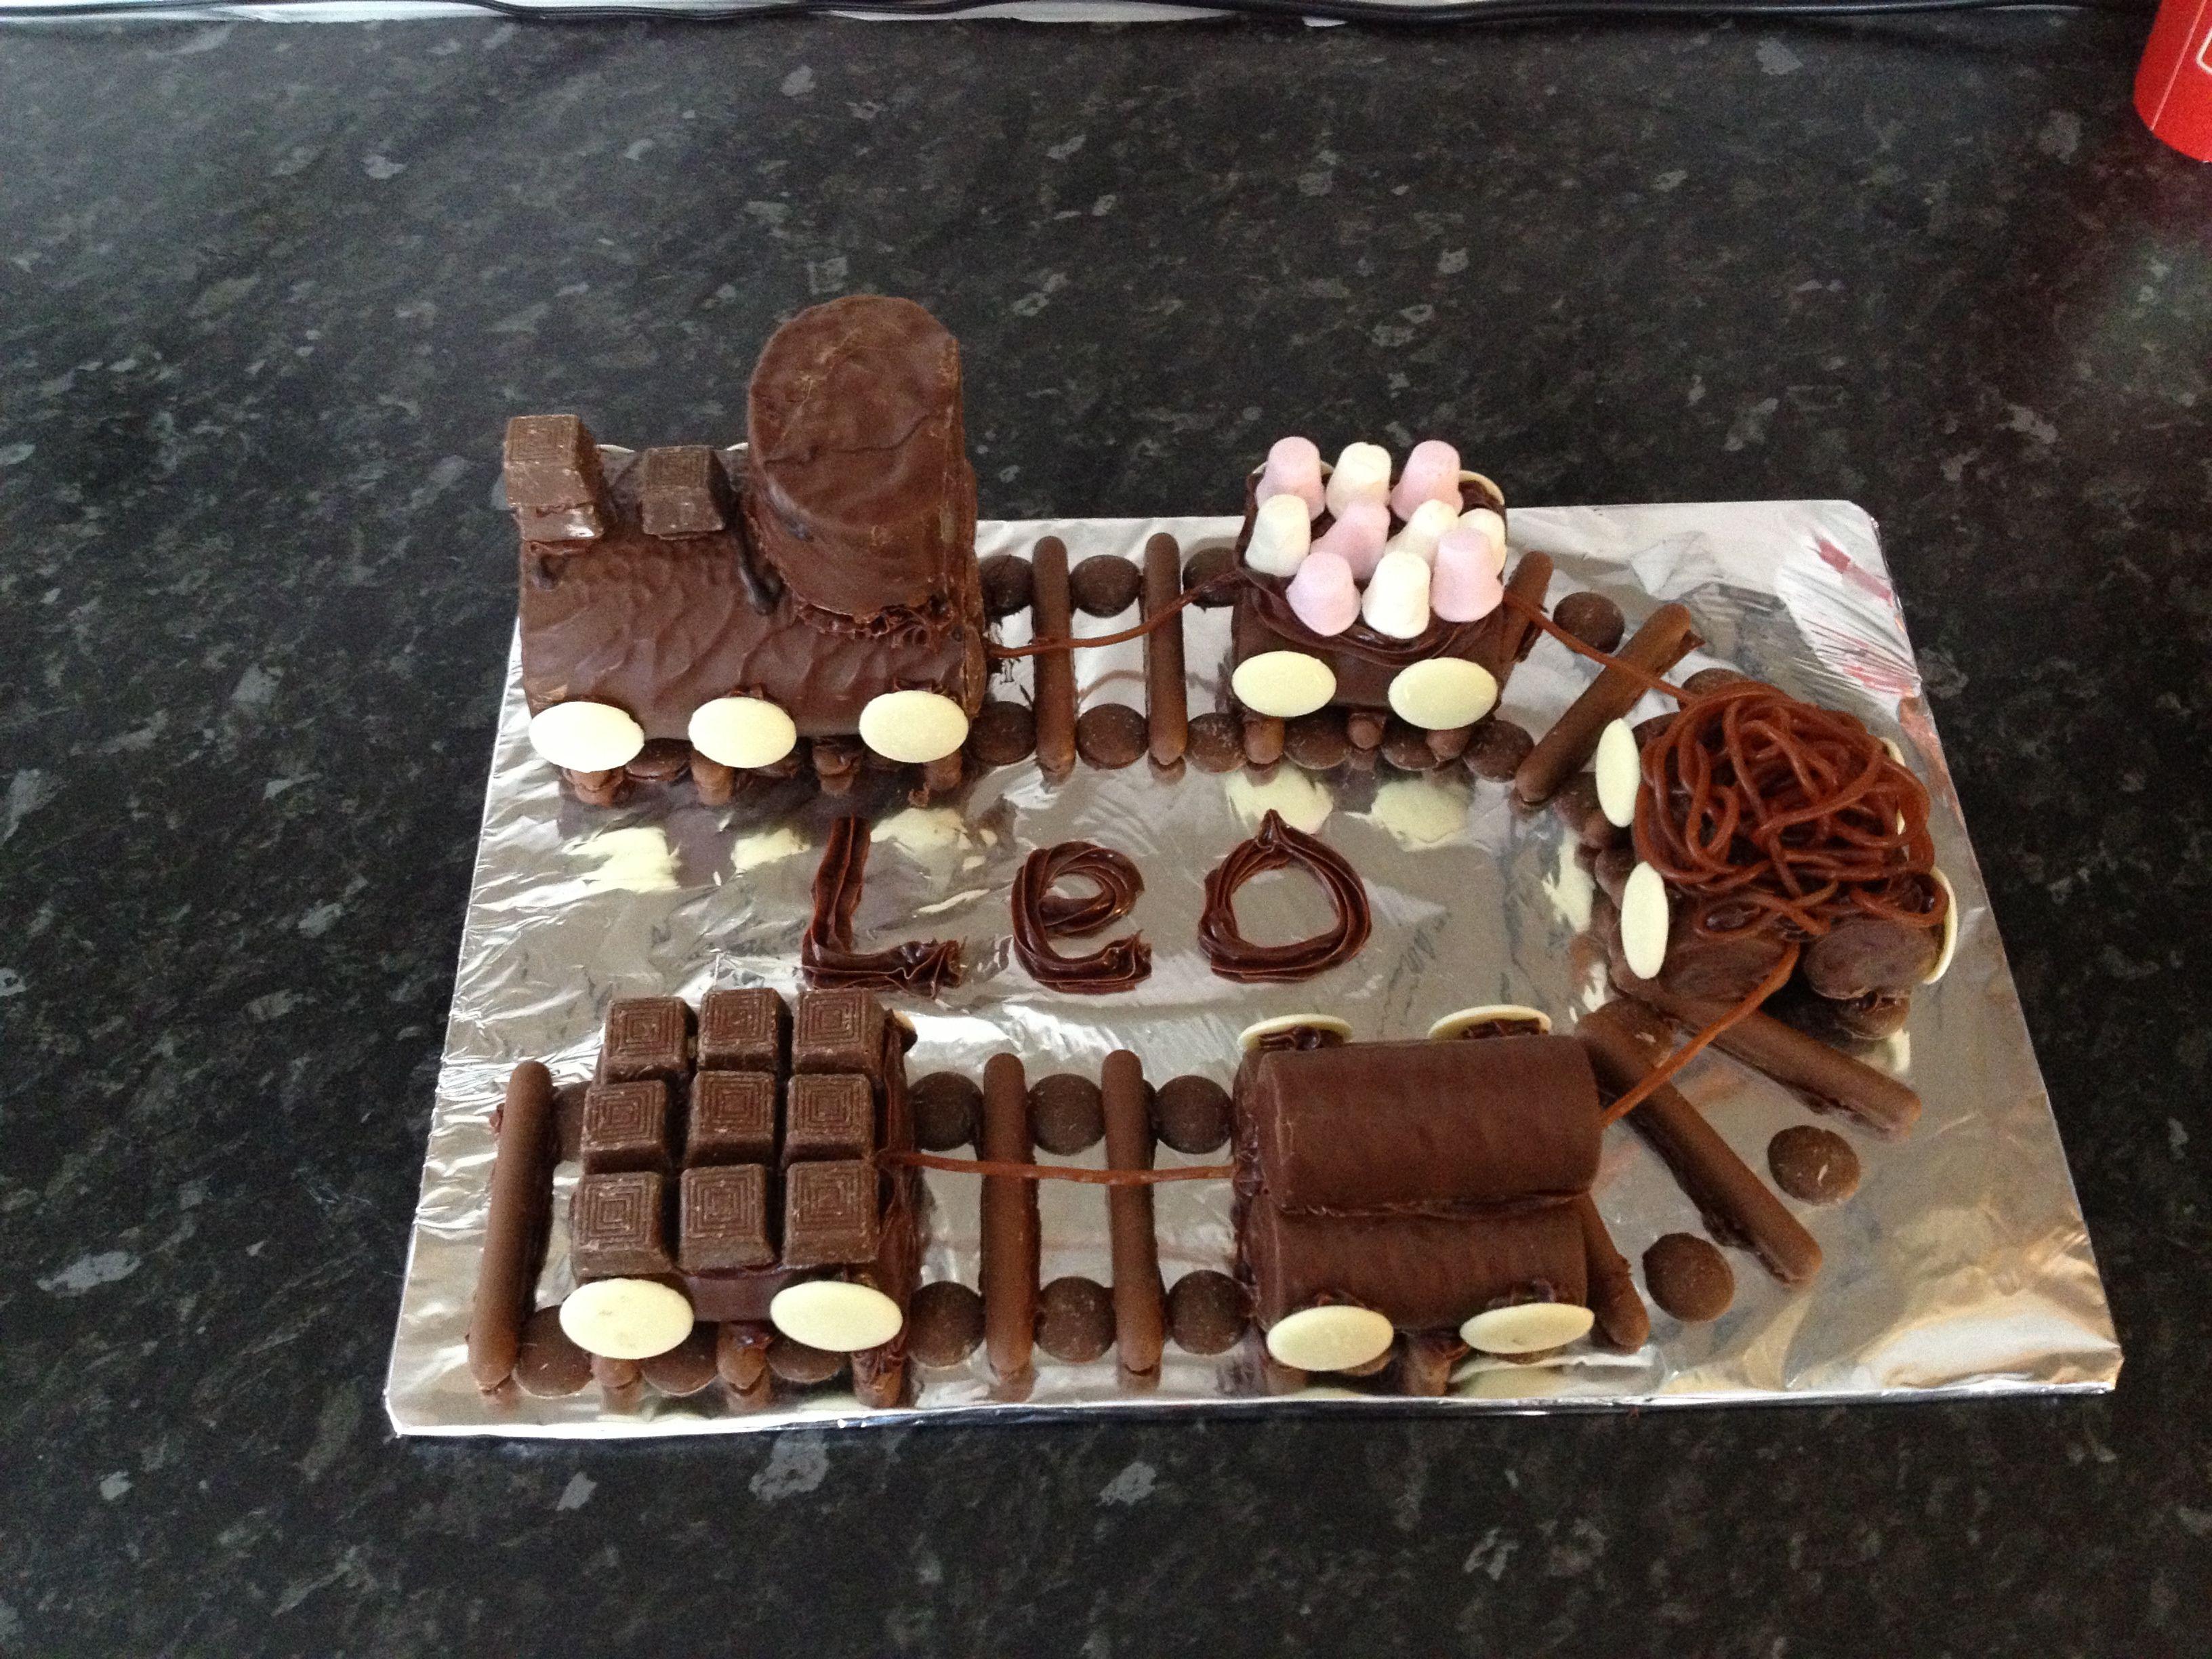 mummy i want a train cake make a train cake that is just on chocolate train birthday cake recipe